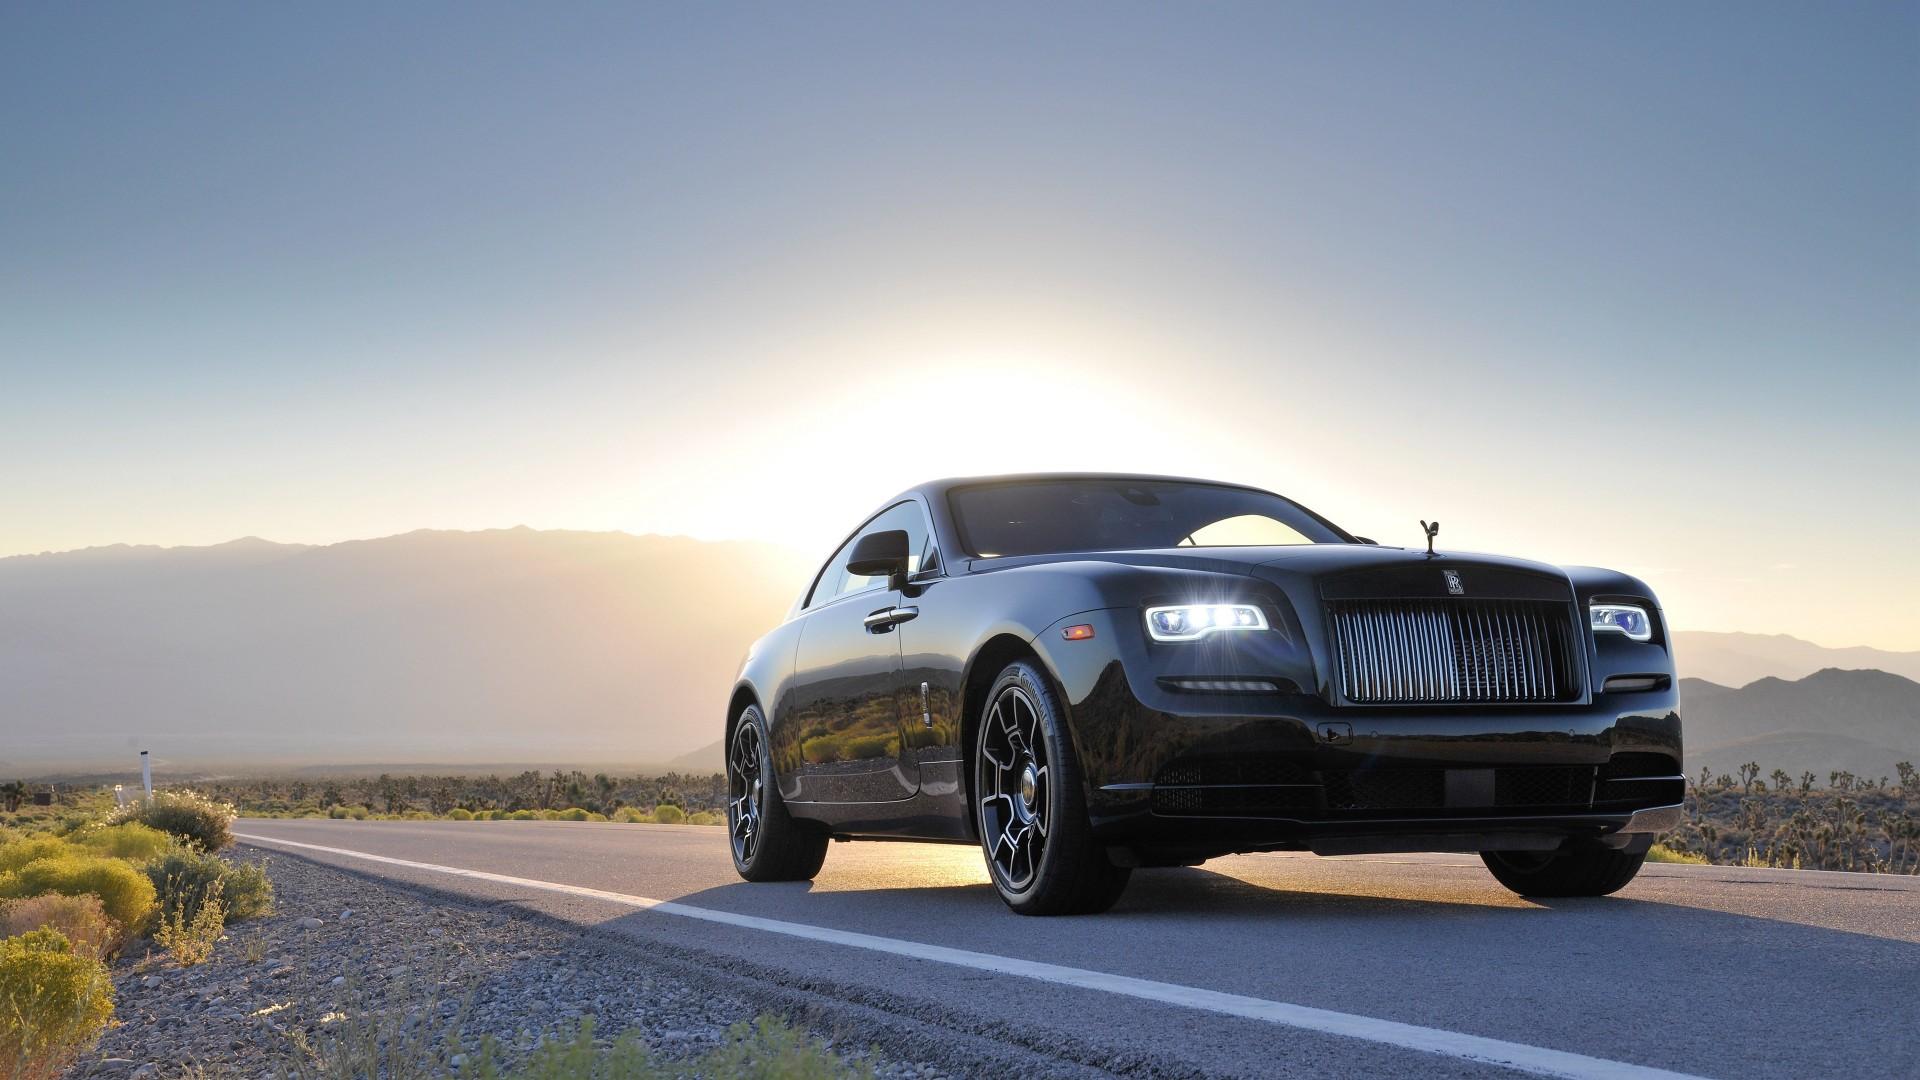 Rolls Royce Wraith Black Badge 4K Wallpaper   HD Car ...